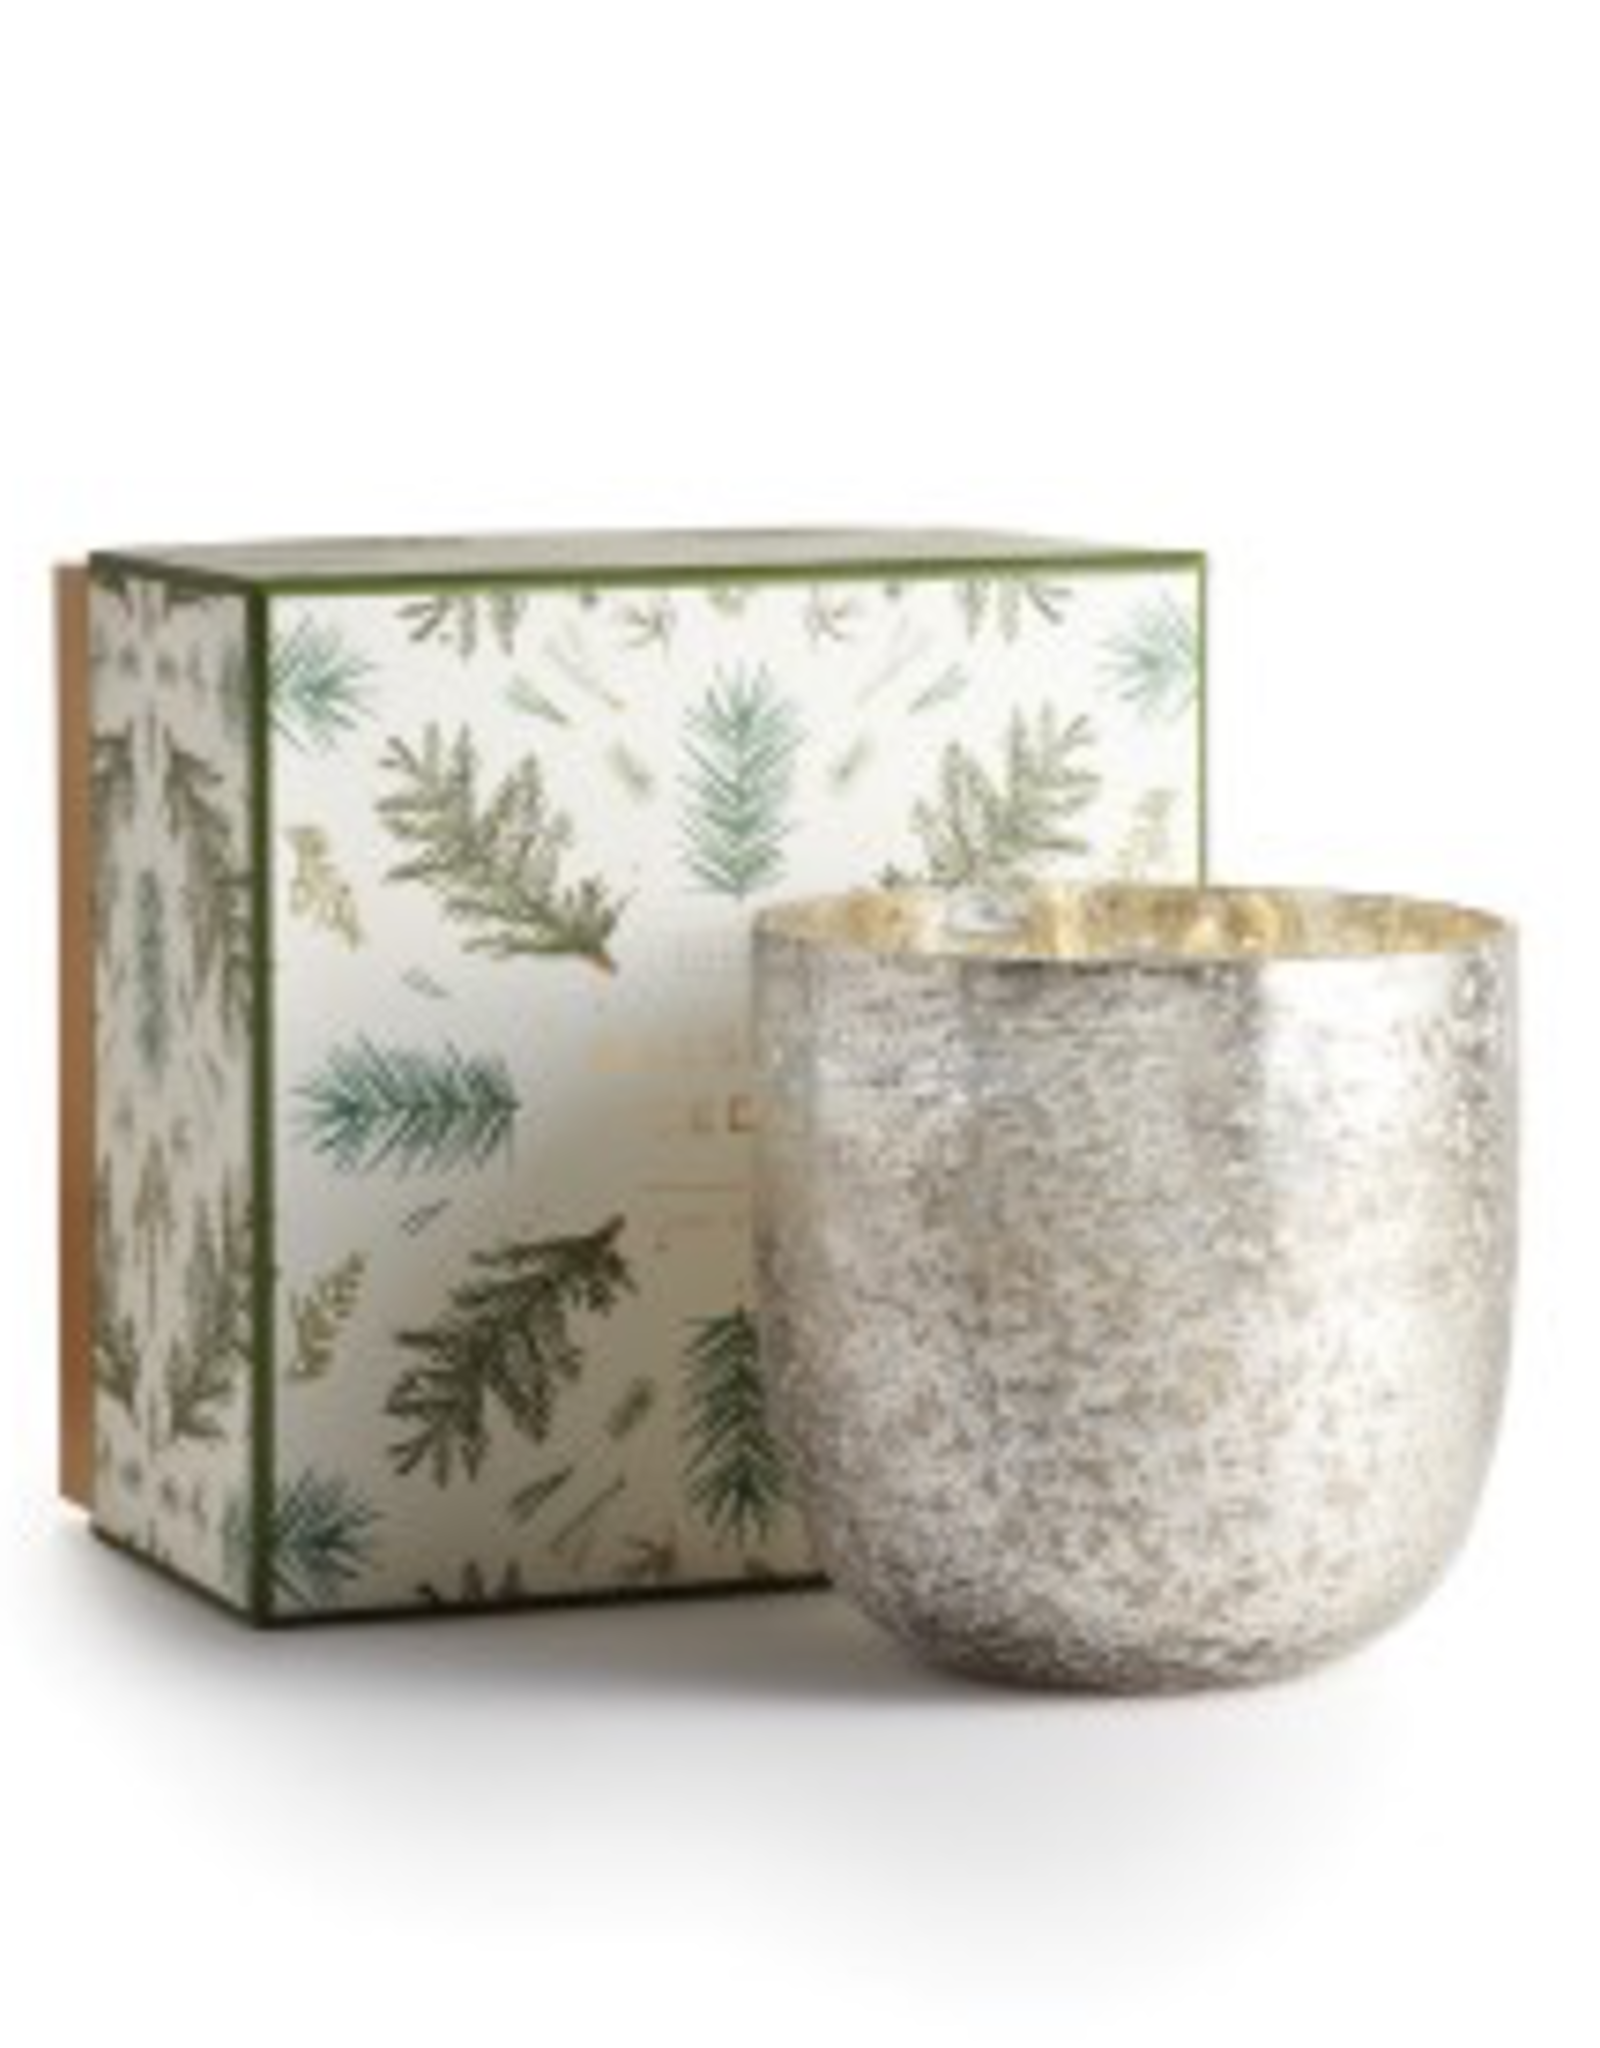 Candle, Balsam & Cedar, Luxe Sanded Mercury